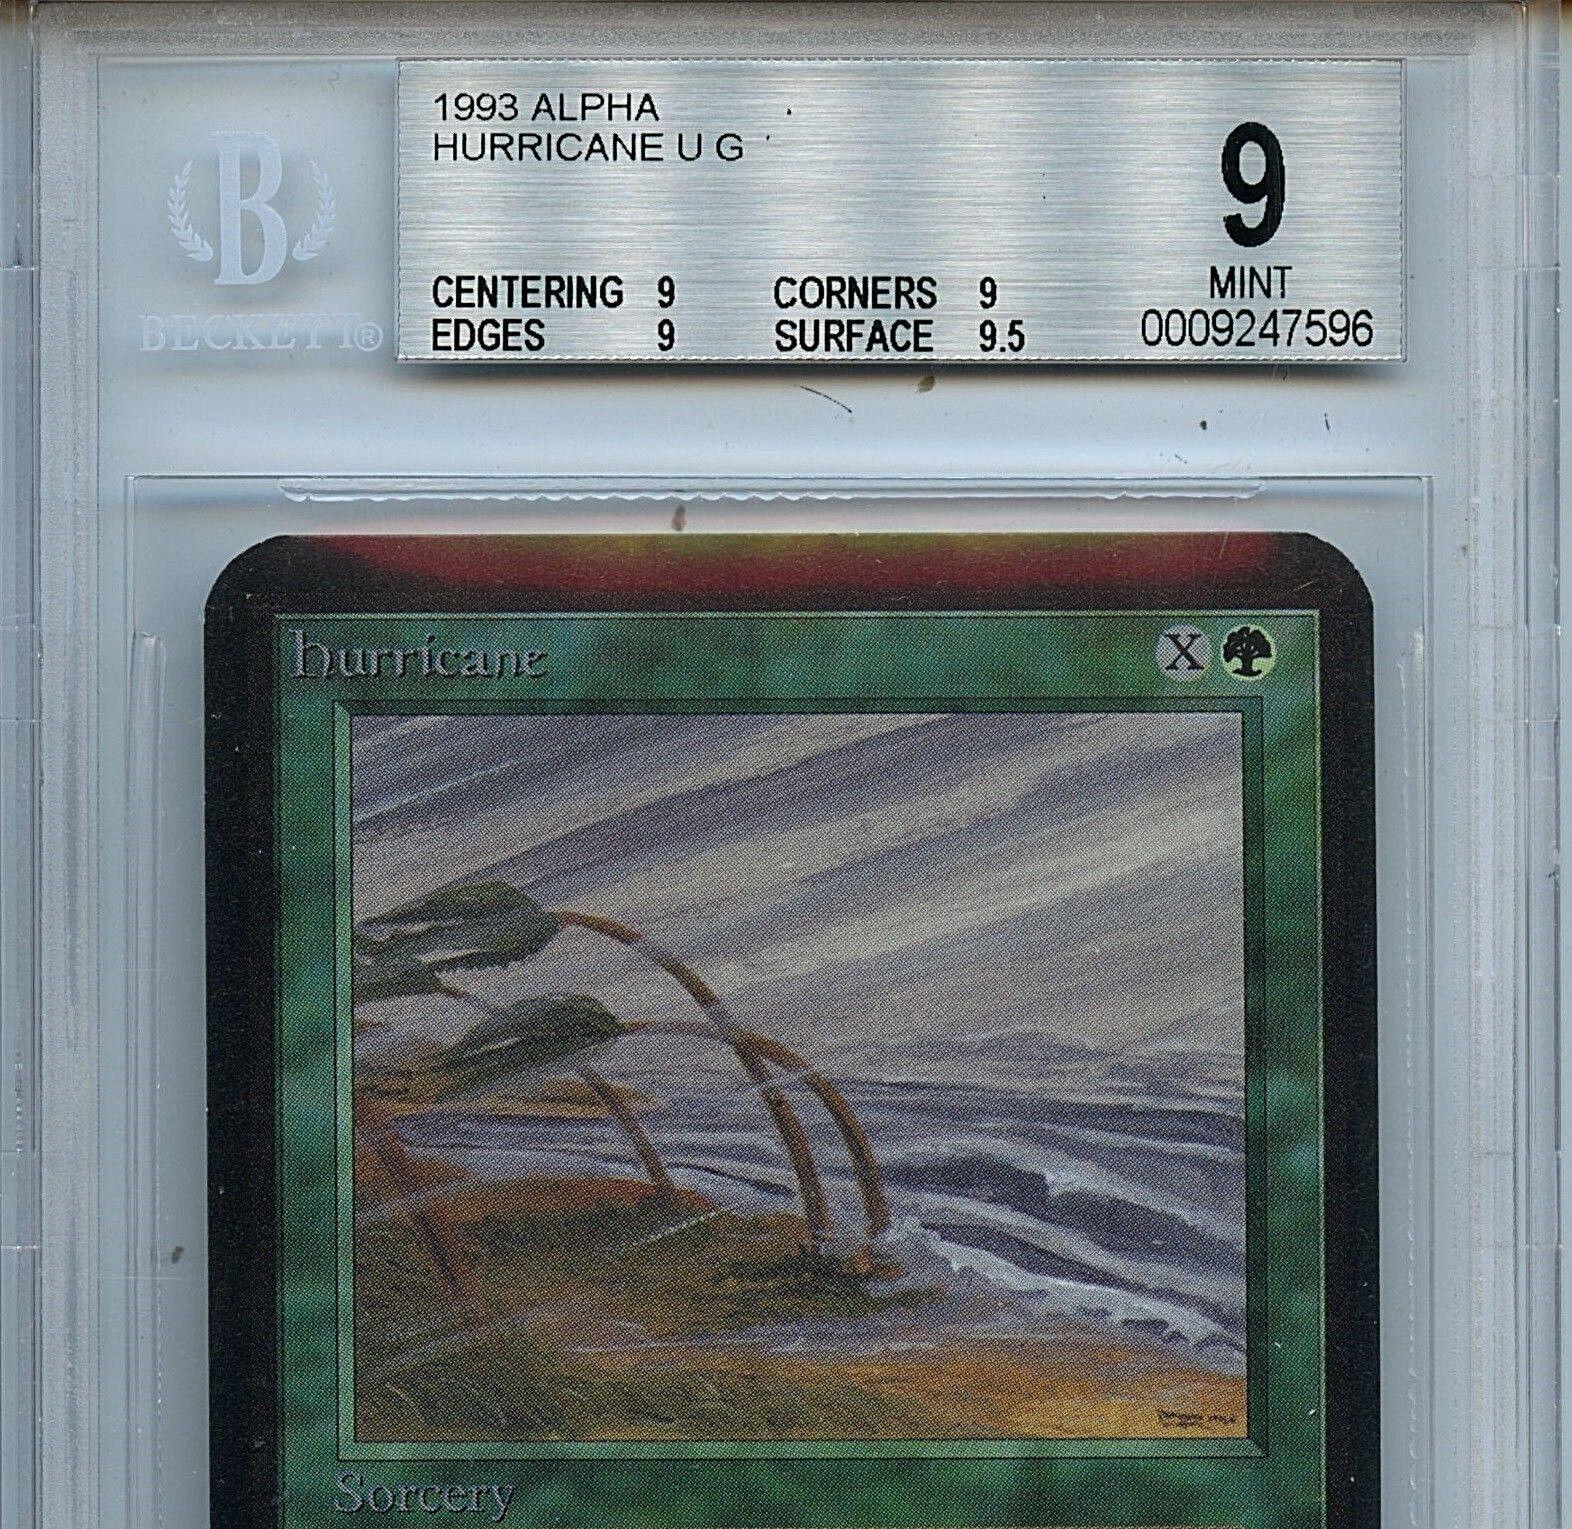 MTG Alpha Hurricane BGS 9.0 (9) Mint Magic The The The Gathering Card 7596 Amricons 4c0c1d